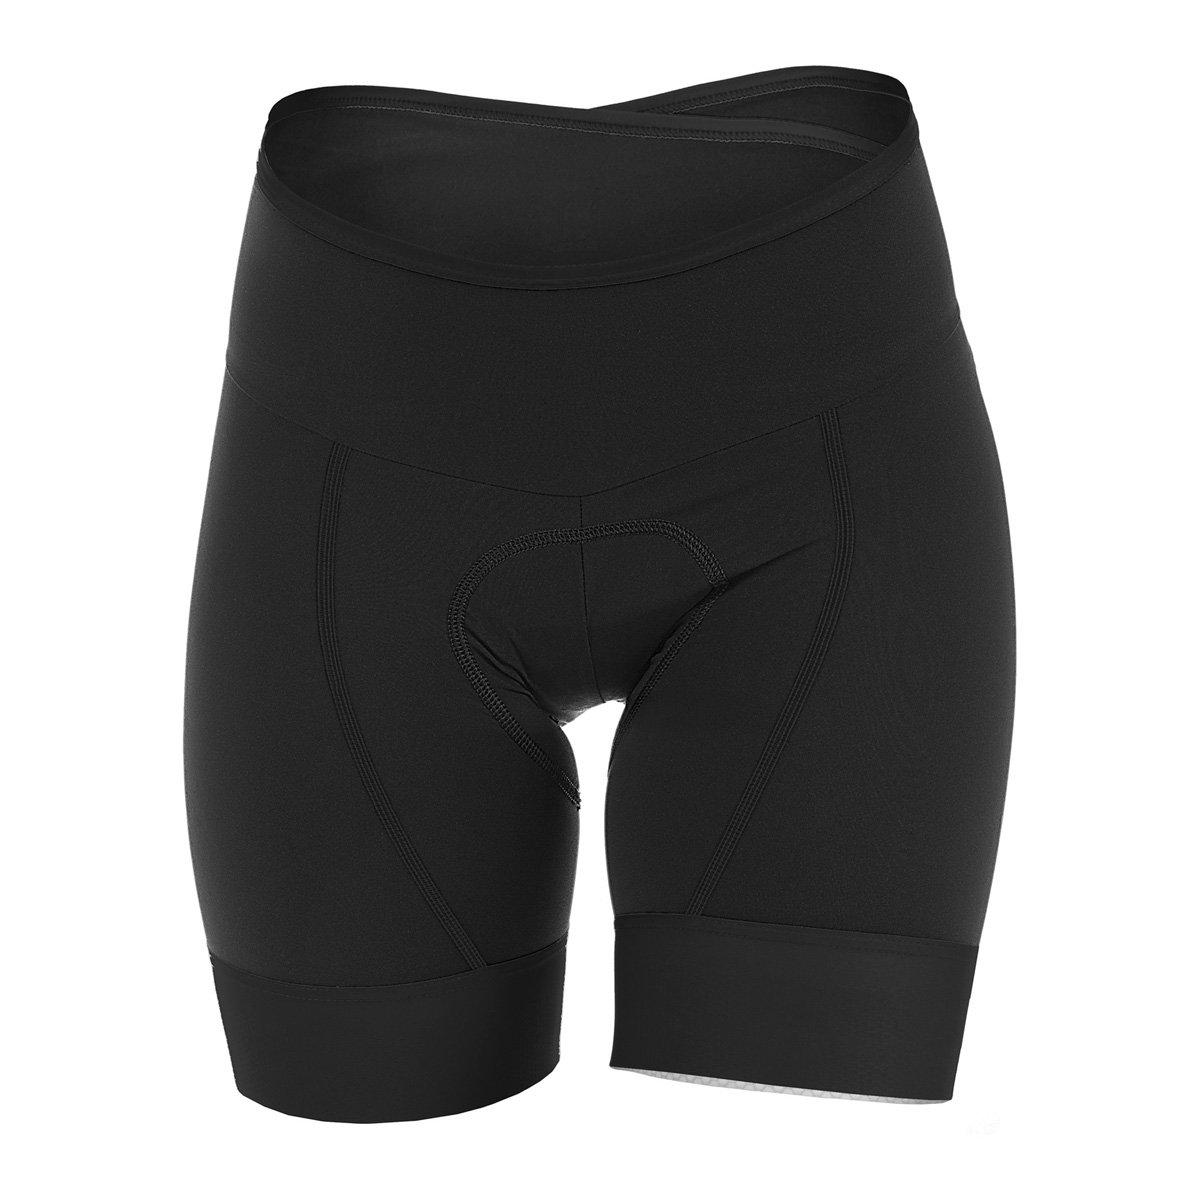 Giordana Lungo Short – Women 's B079NFSLCP Large|ブラック ブラック Large